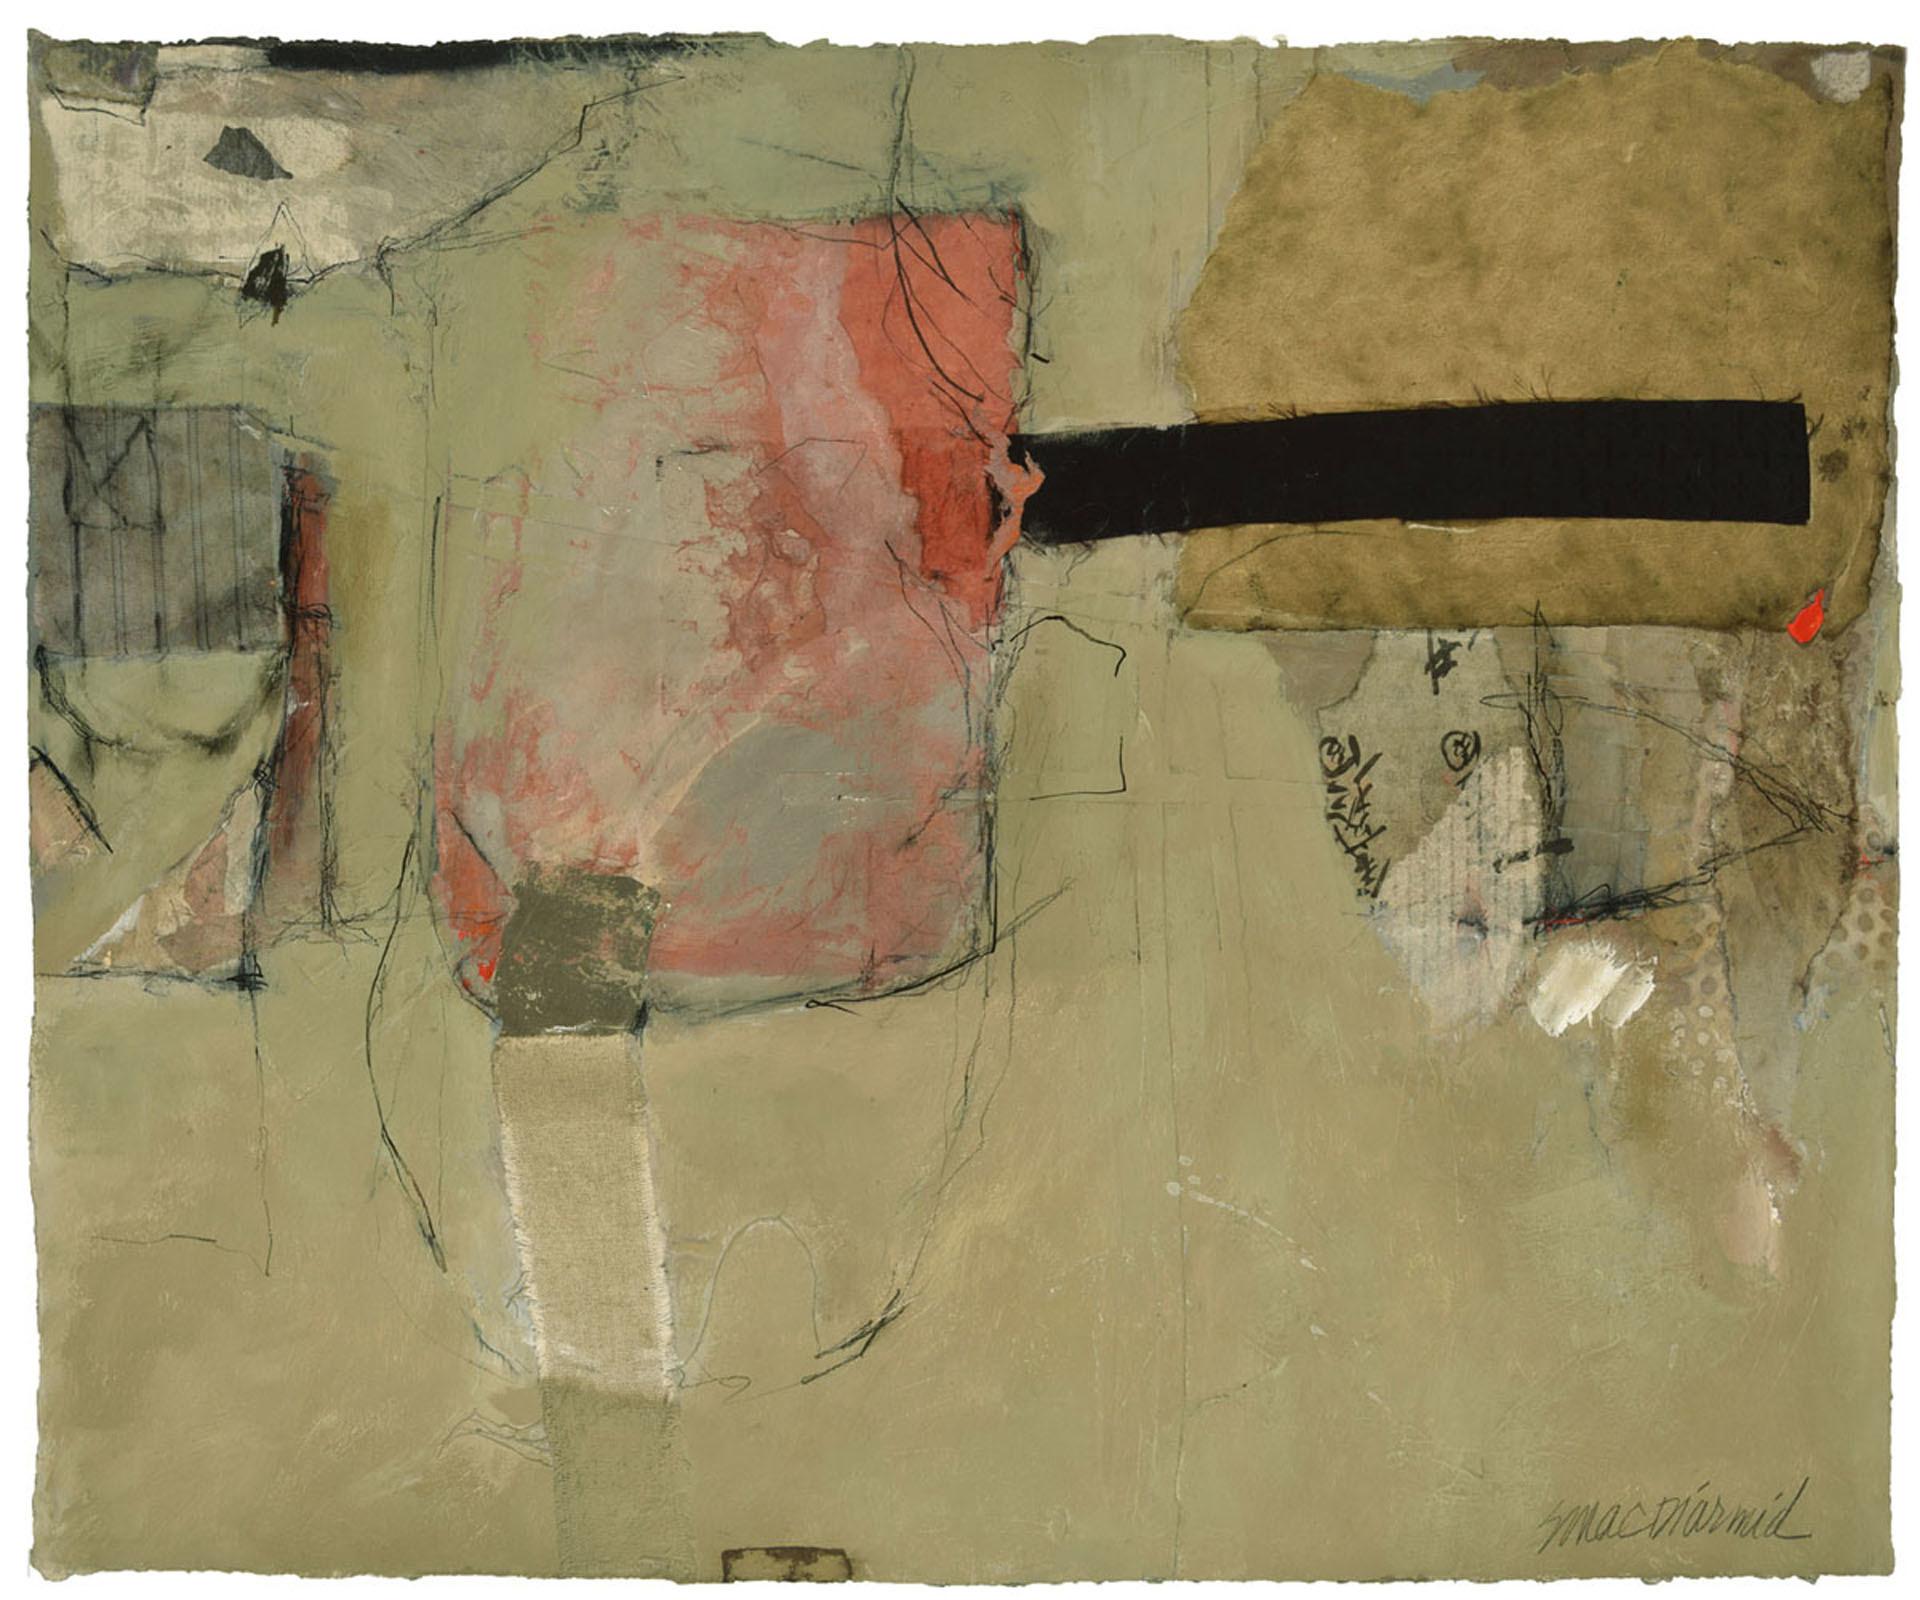 Sandra MacDiarmid, Color and Stillness